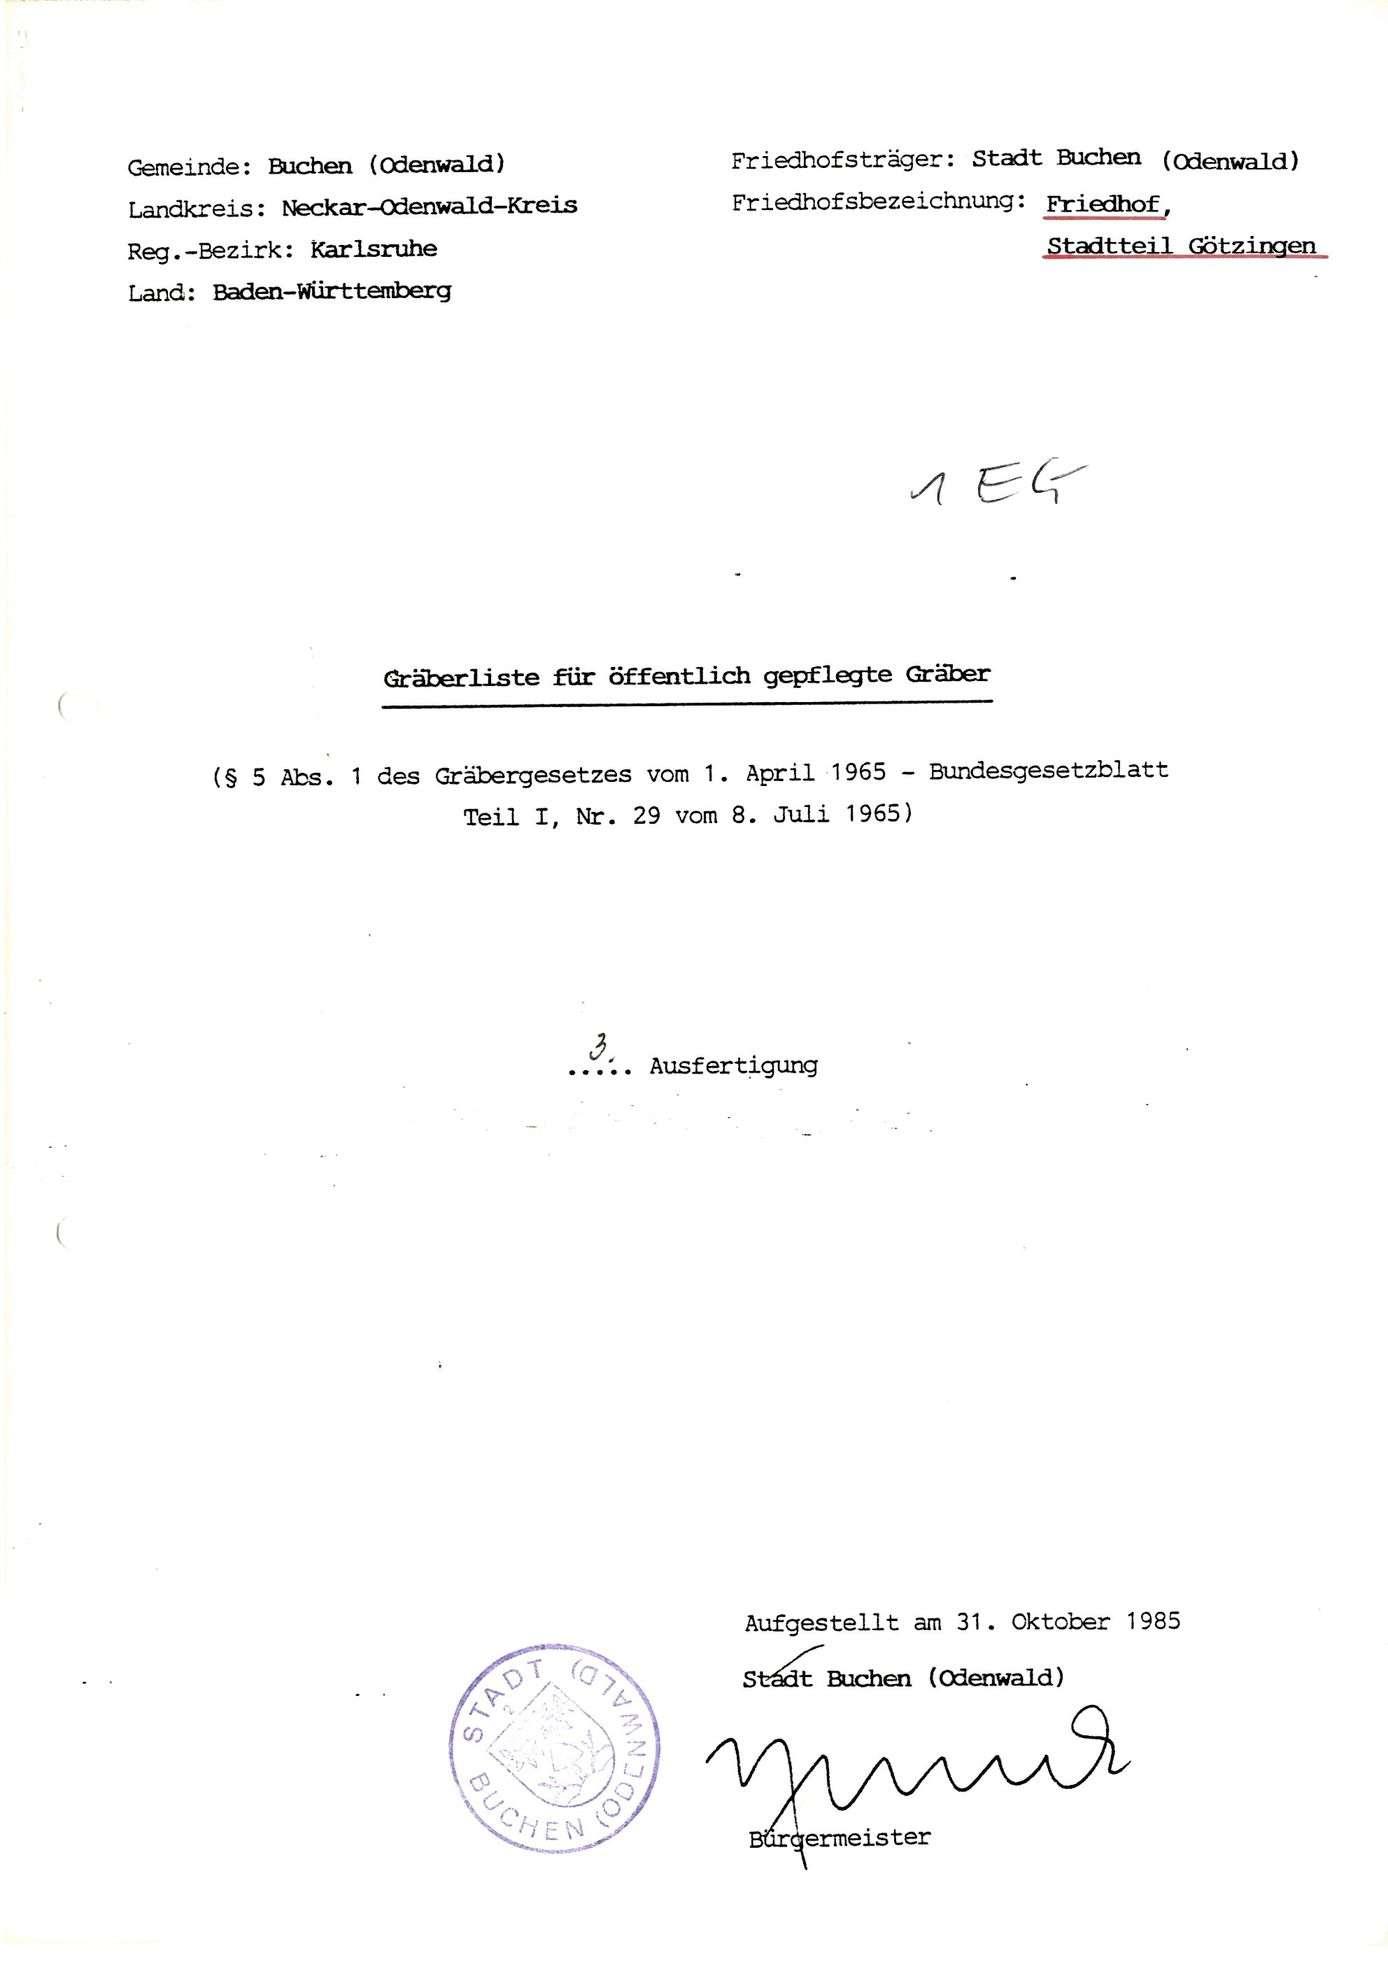 Götzingen, Bild 1